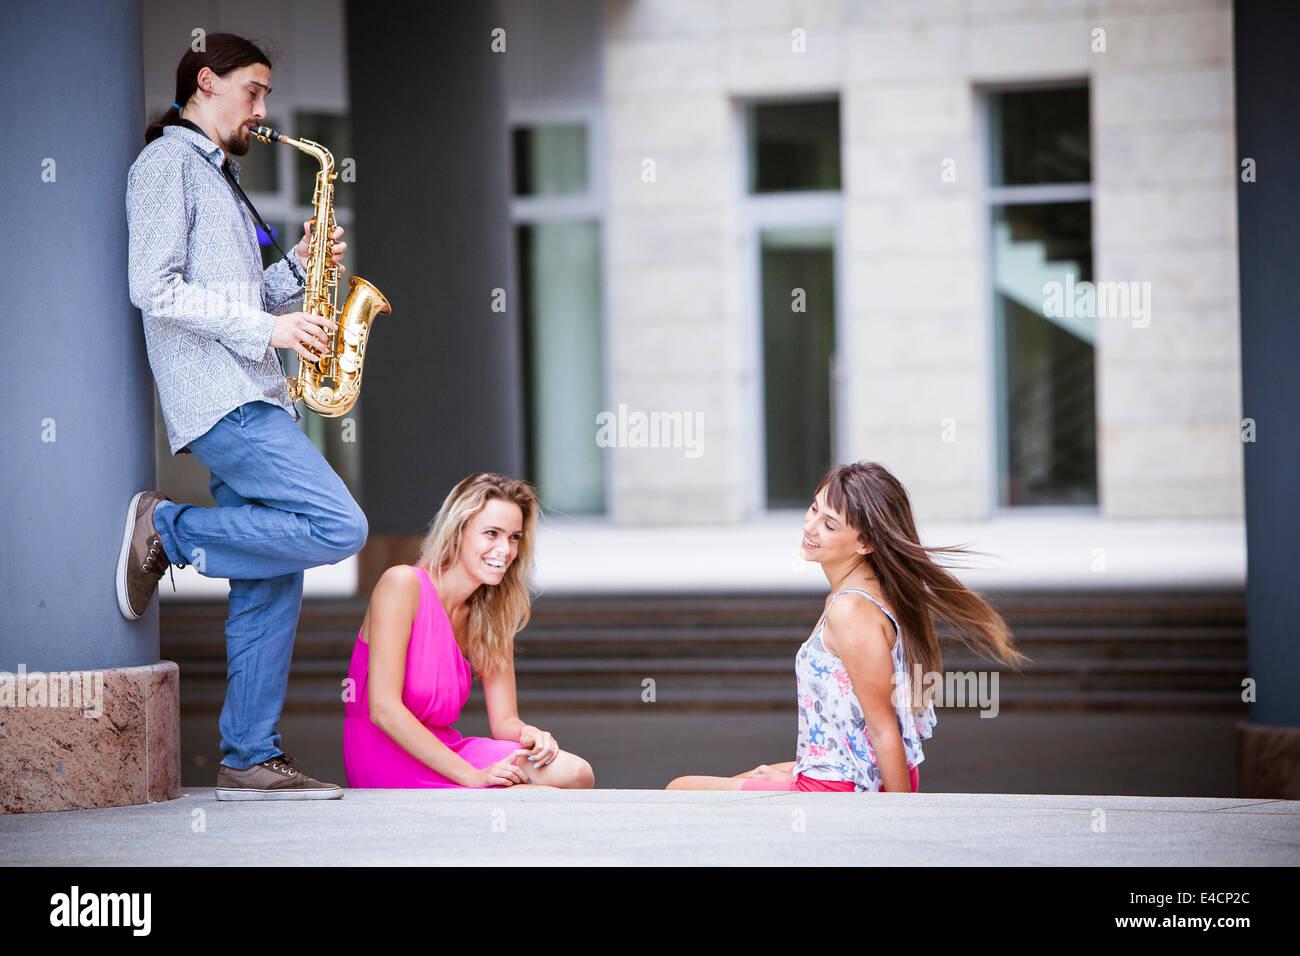 Man spielt Saxophon, Frauen, Osijek, Kroatien Stockbild